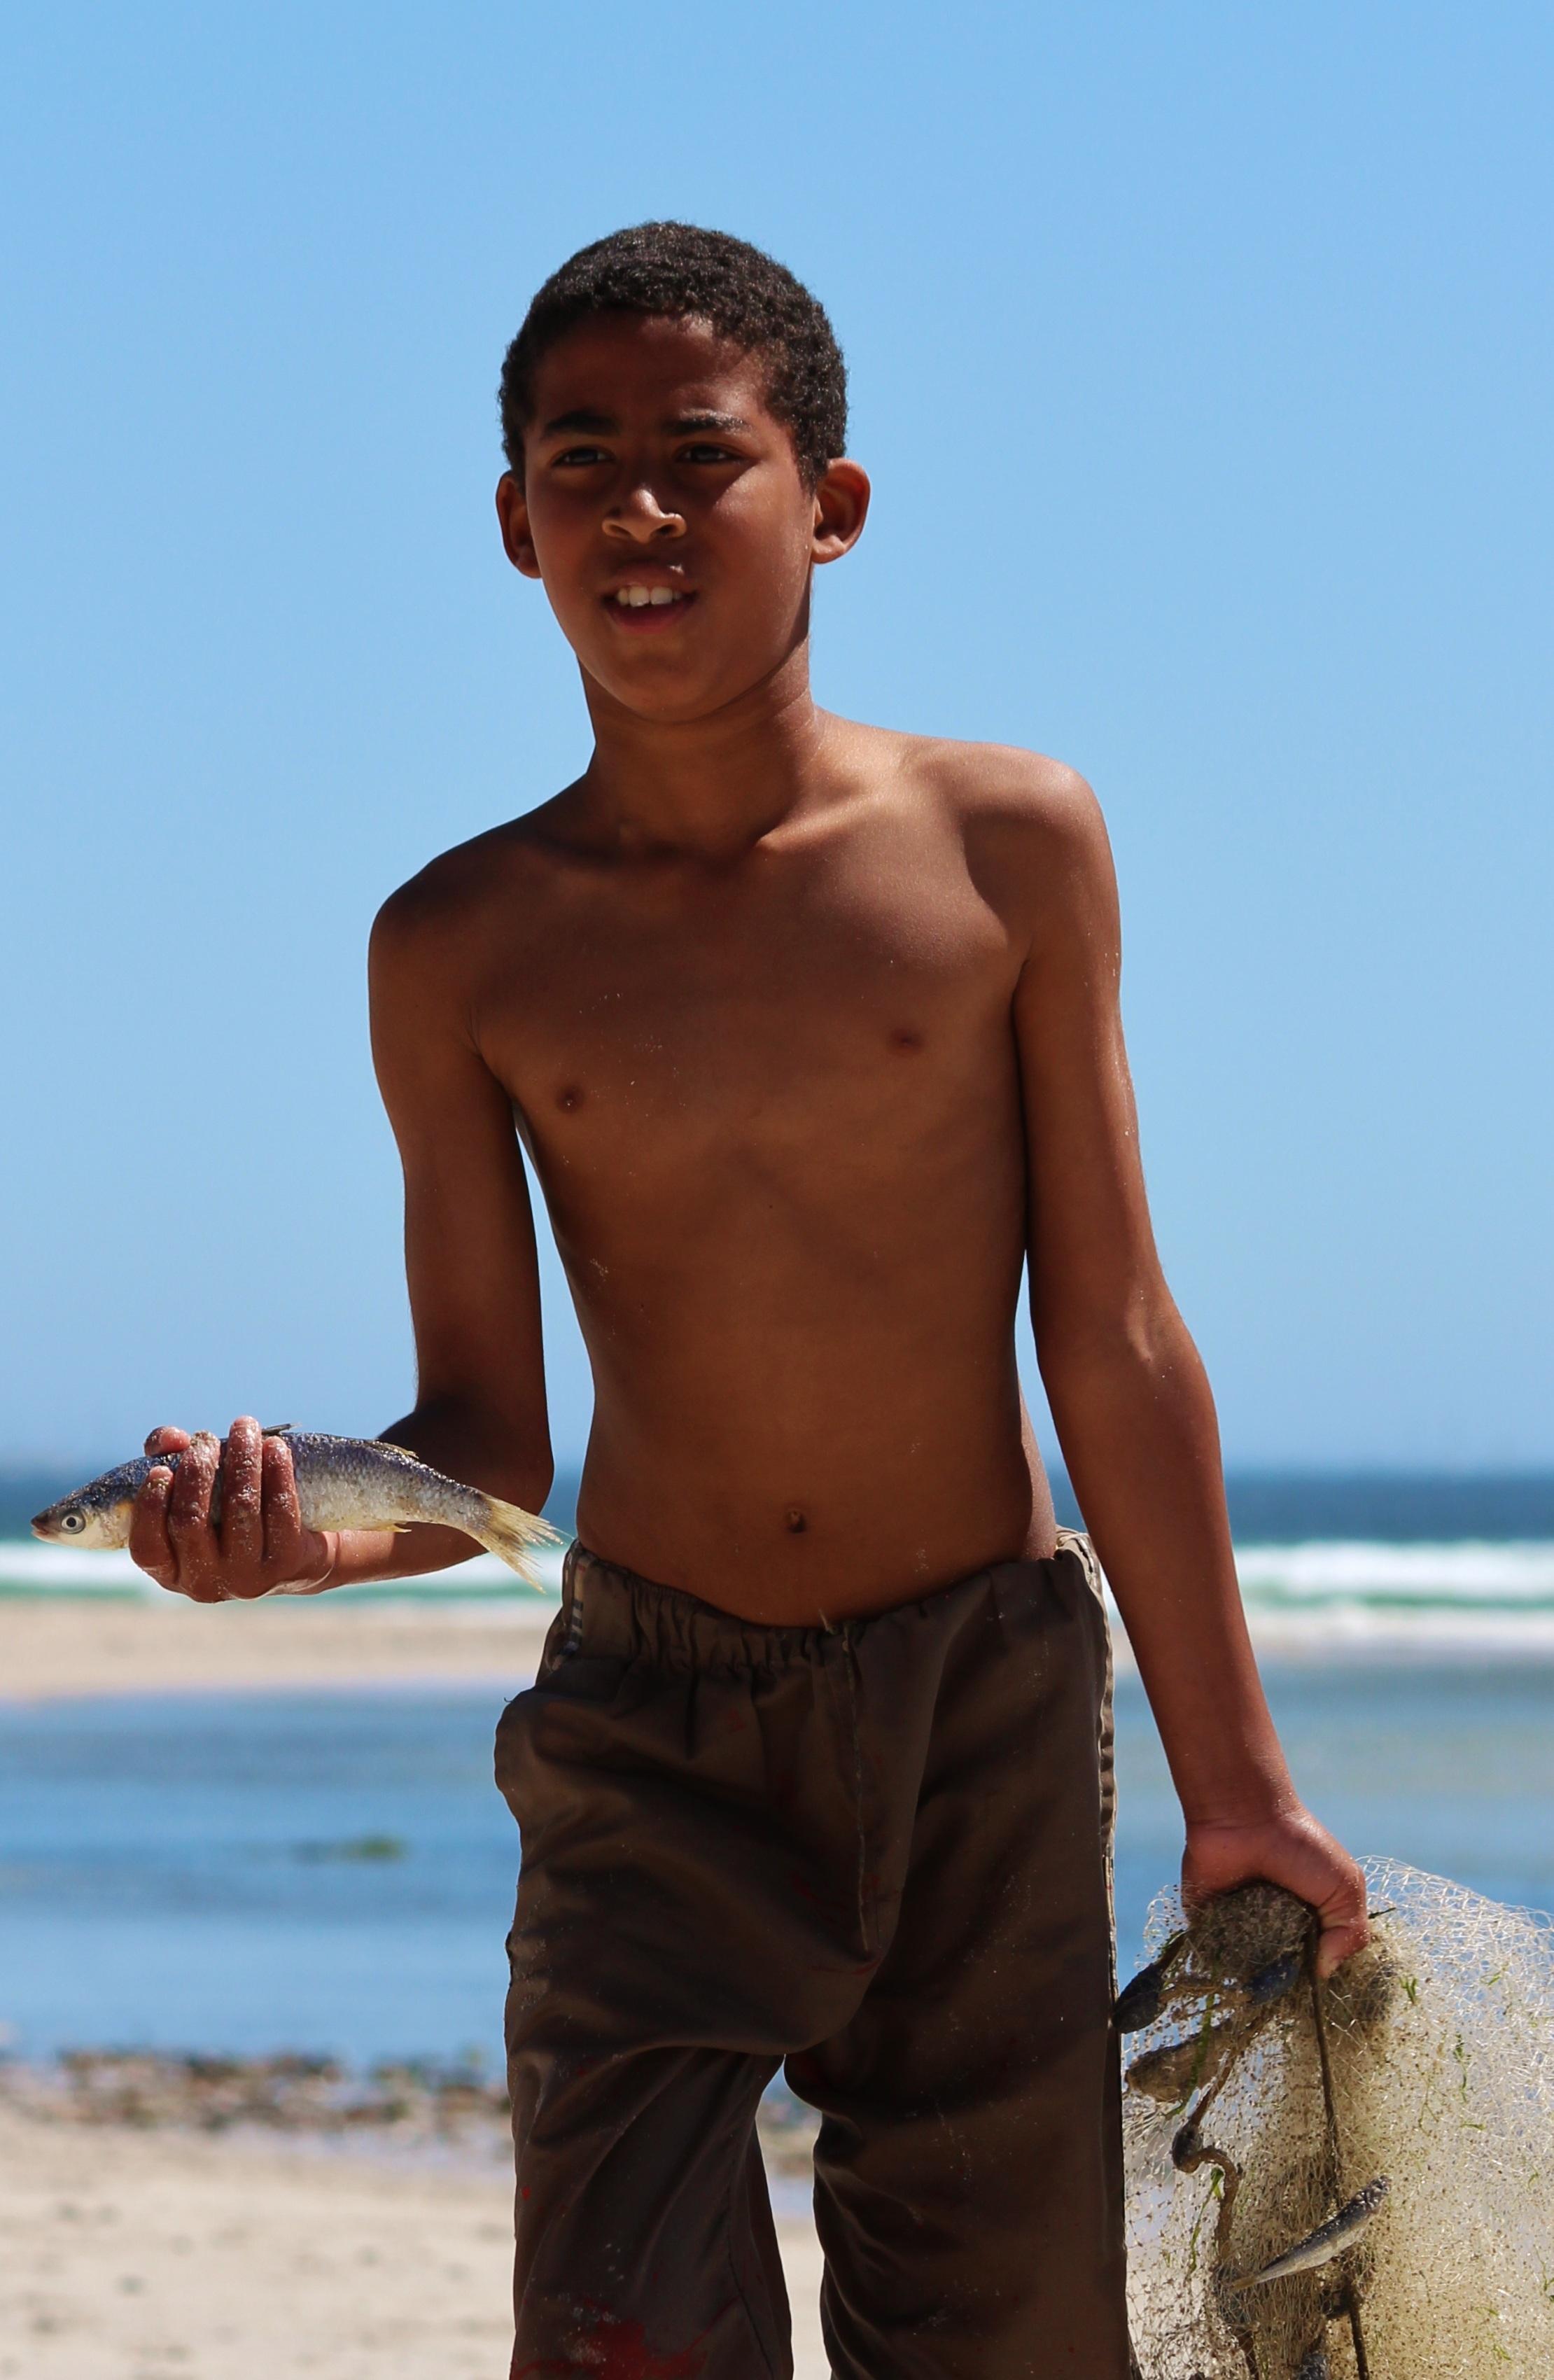 Free Images : man, beach, sea, coast, sand, person, people ...